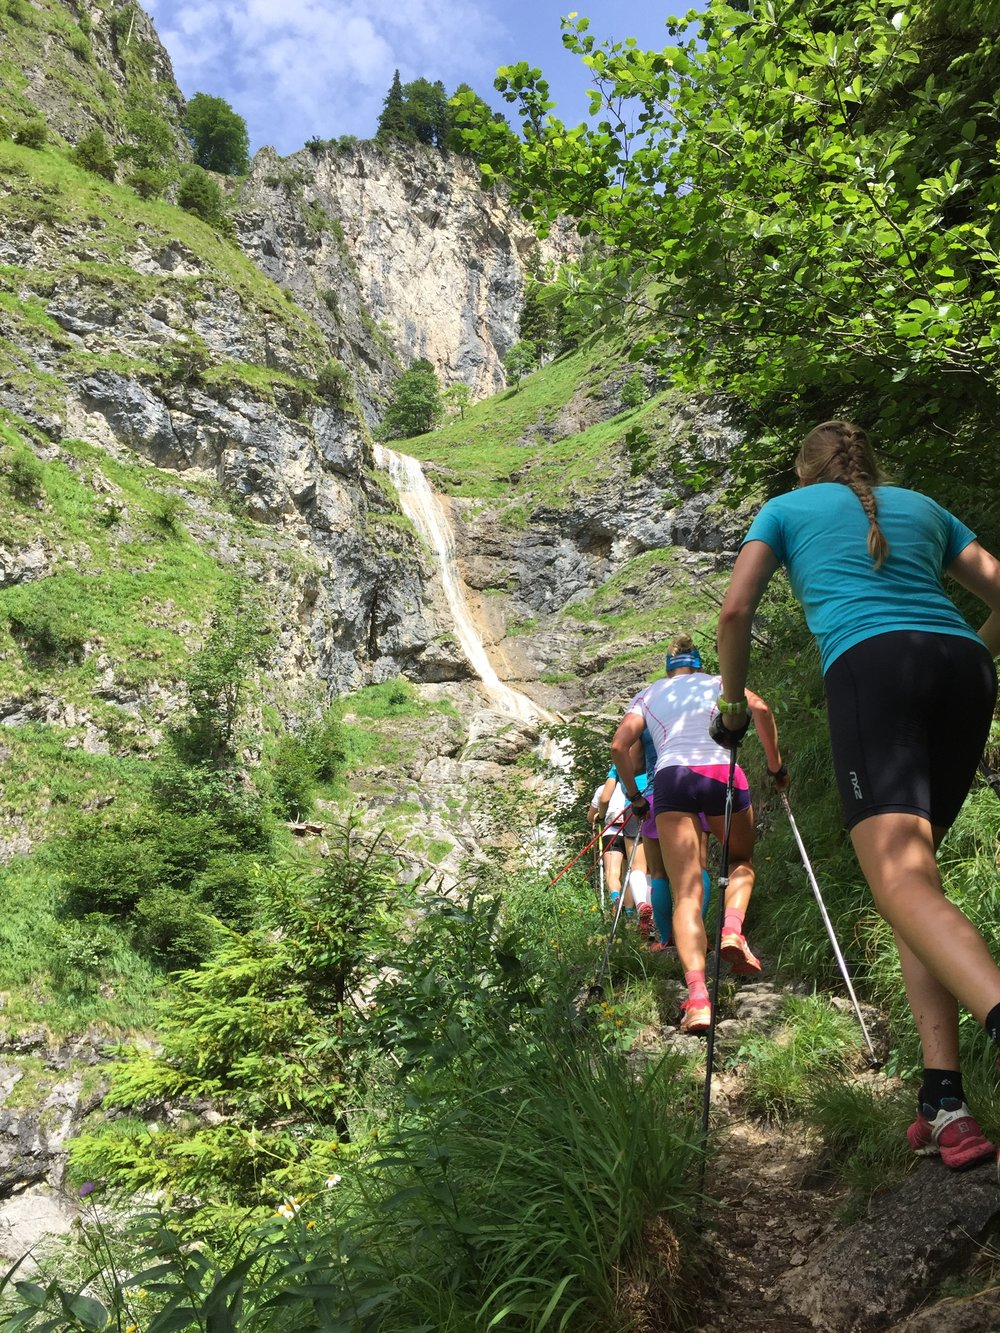 A long training tour near Sonthofen/Oberstdorf, Germany